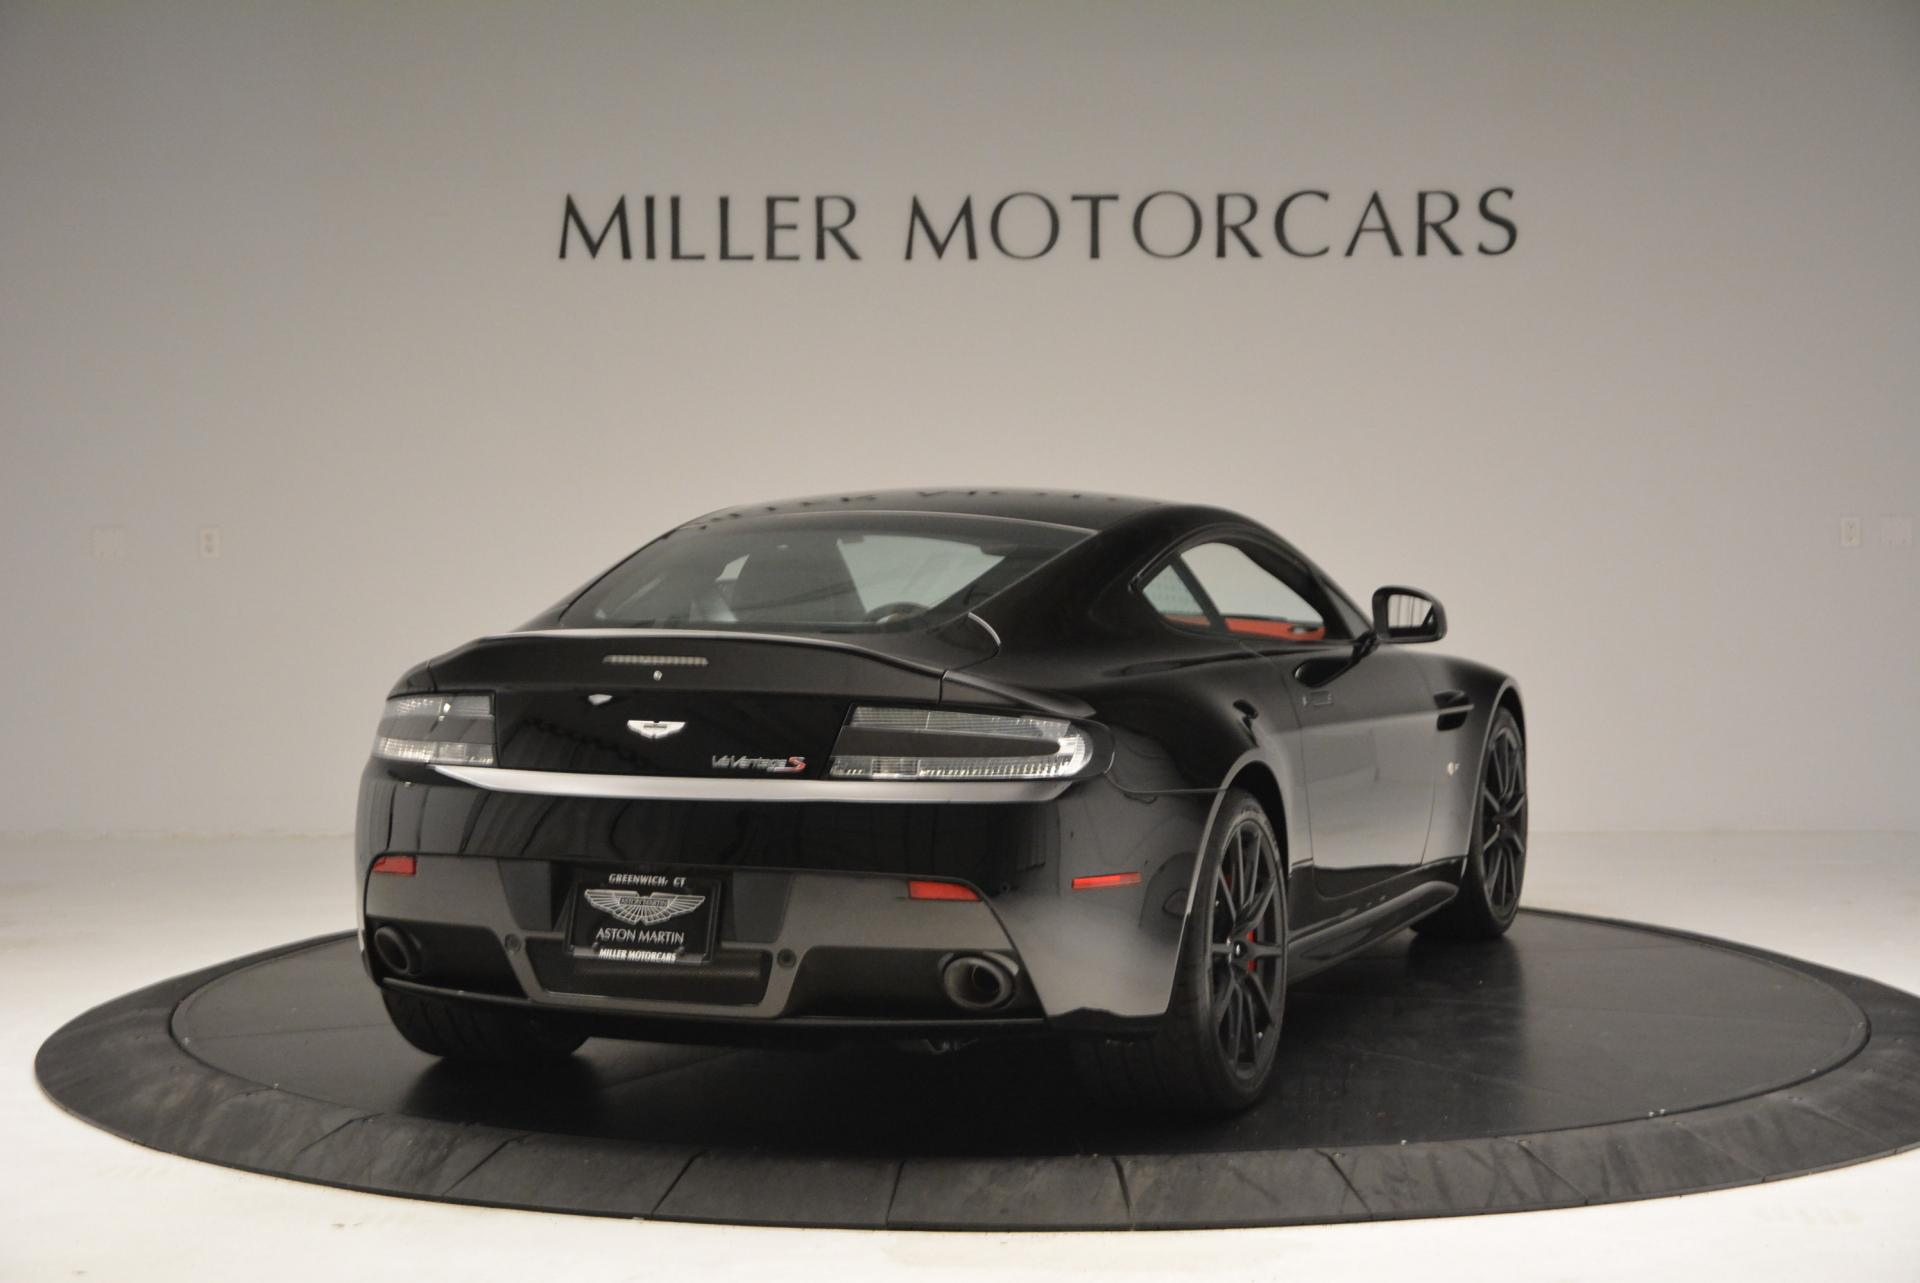 New 2015 Aston Martin V12 Vantage S  For Sale In Greenwich, CT 103_p7